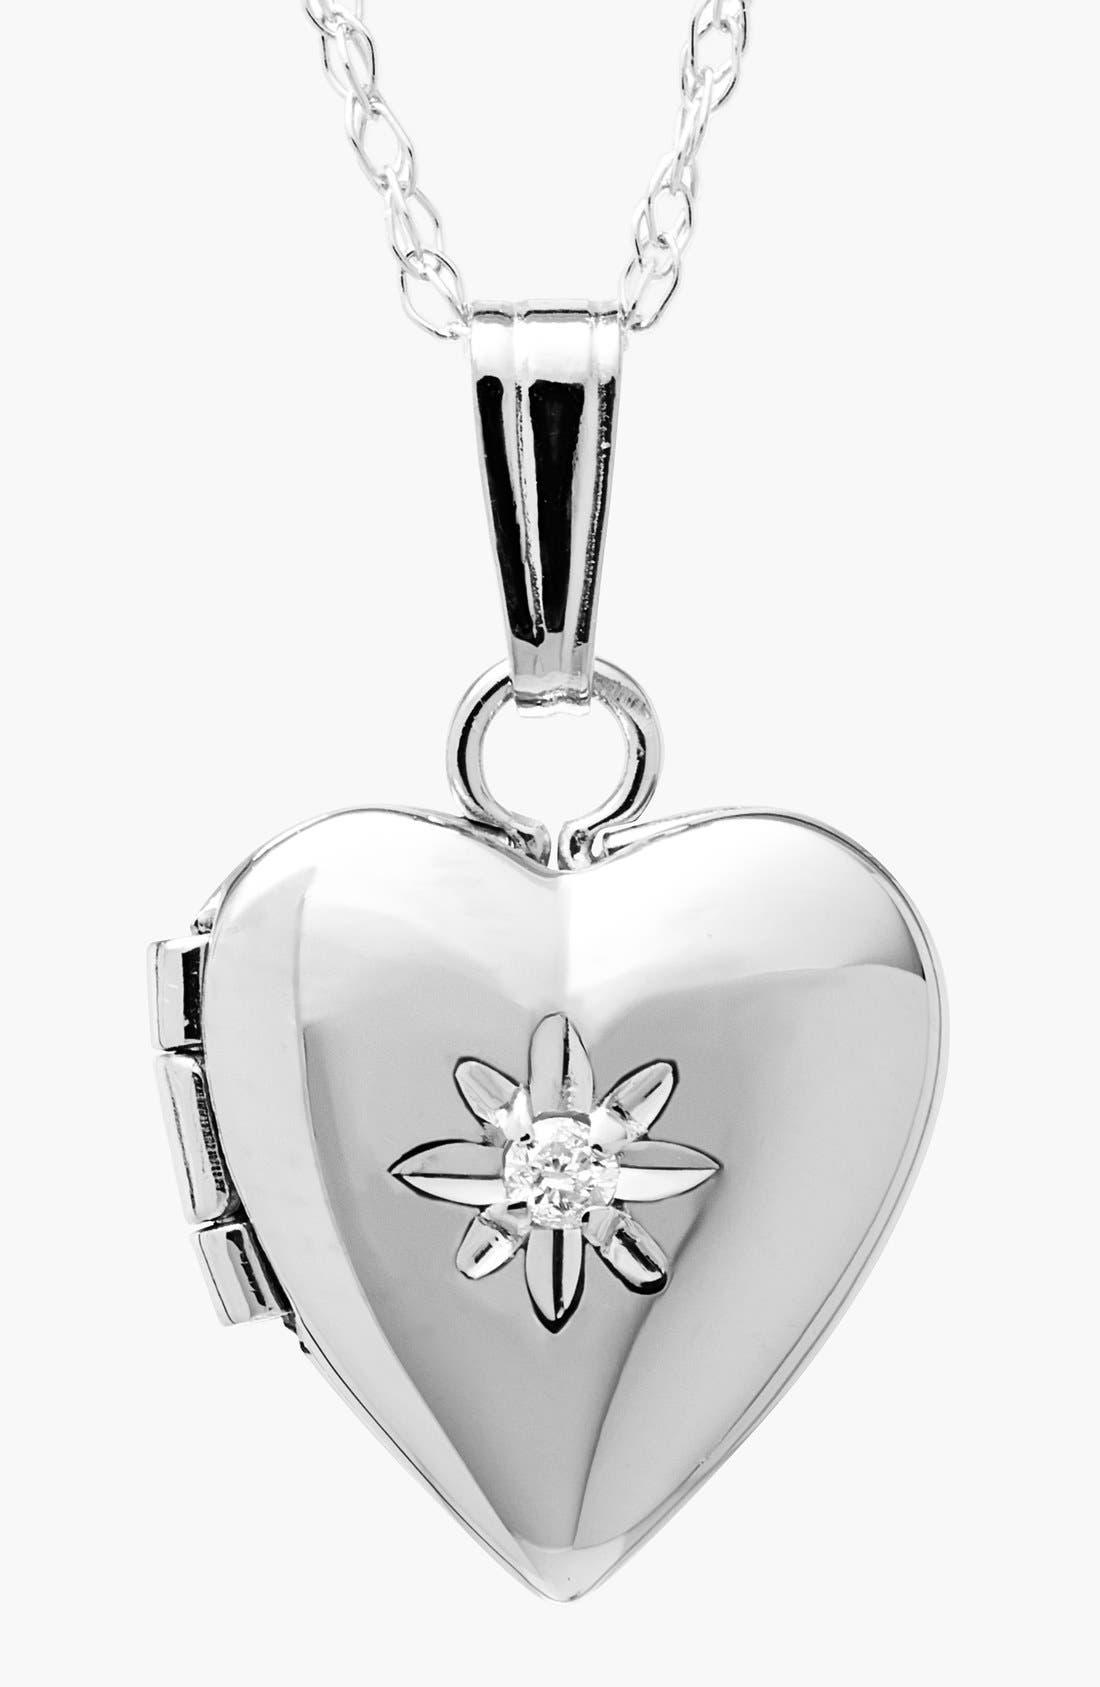 14k White Gold Heart Locket Necklace,                             Main thumbnail 1, color,                             040